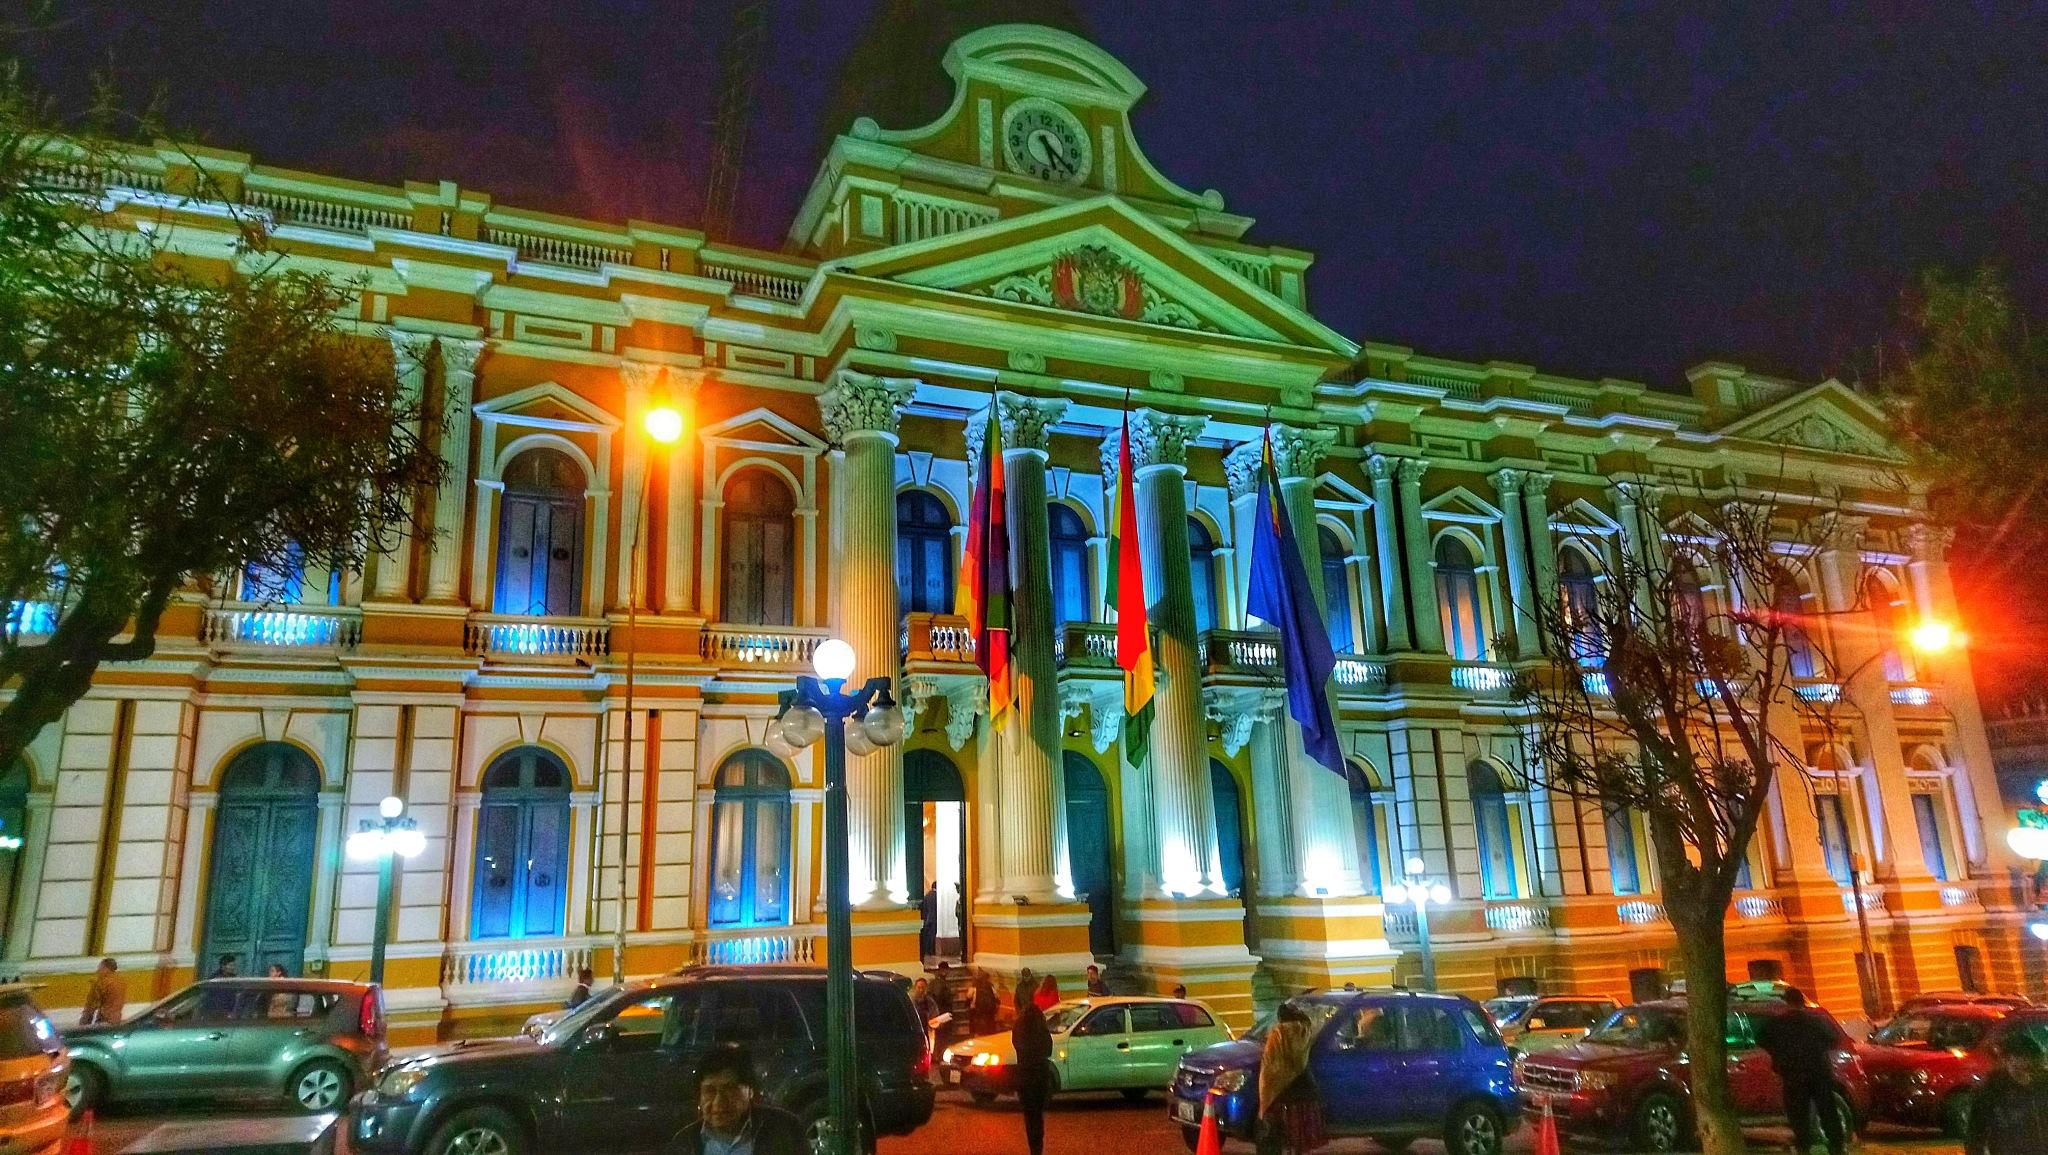 Congreso Nacional Bolivia by Victor Heredia Pineda